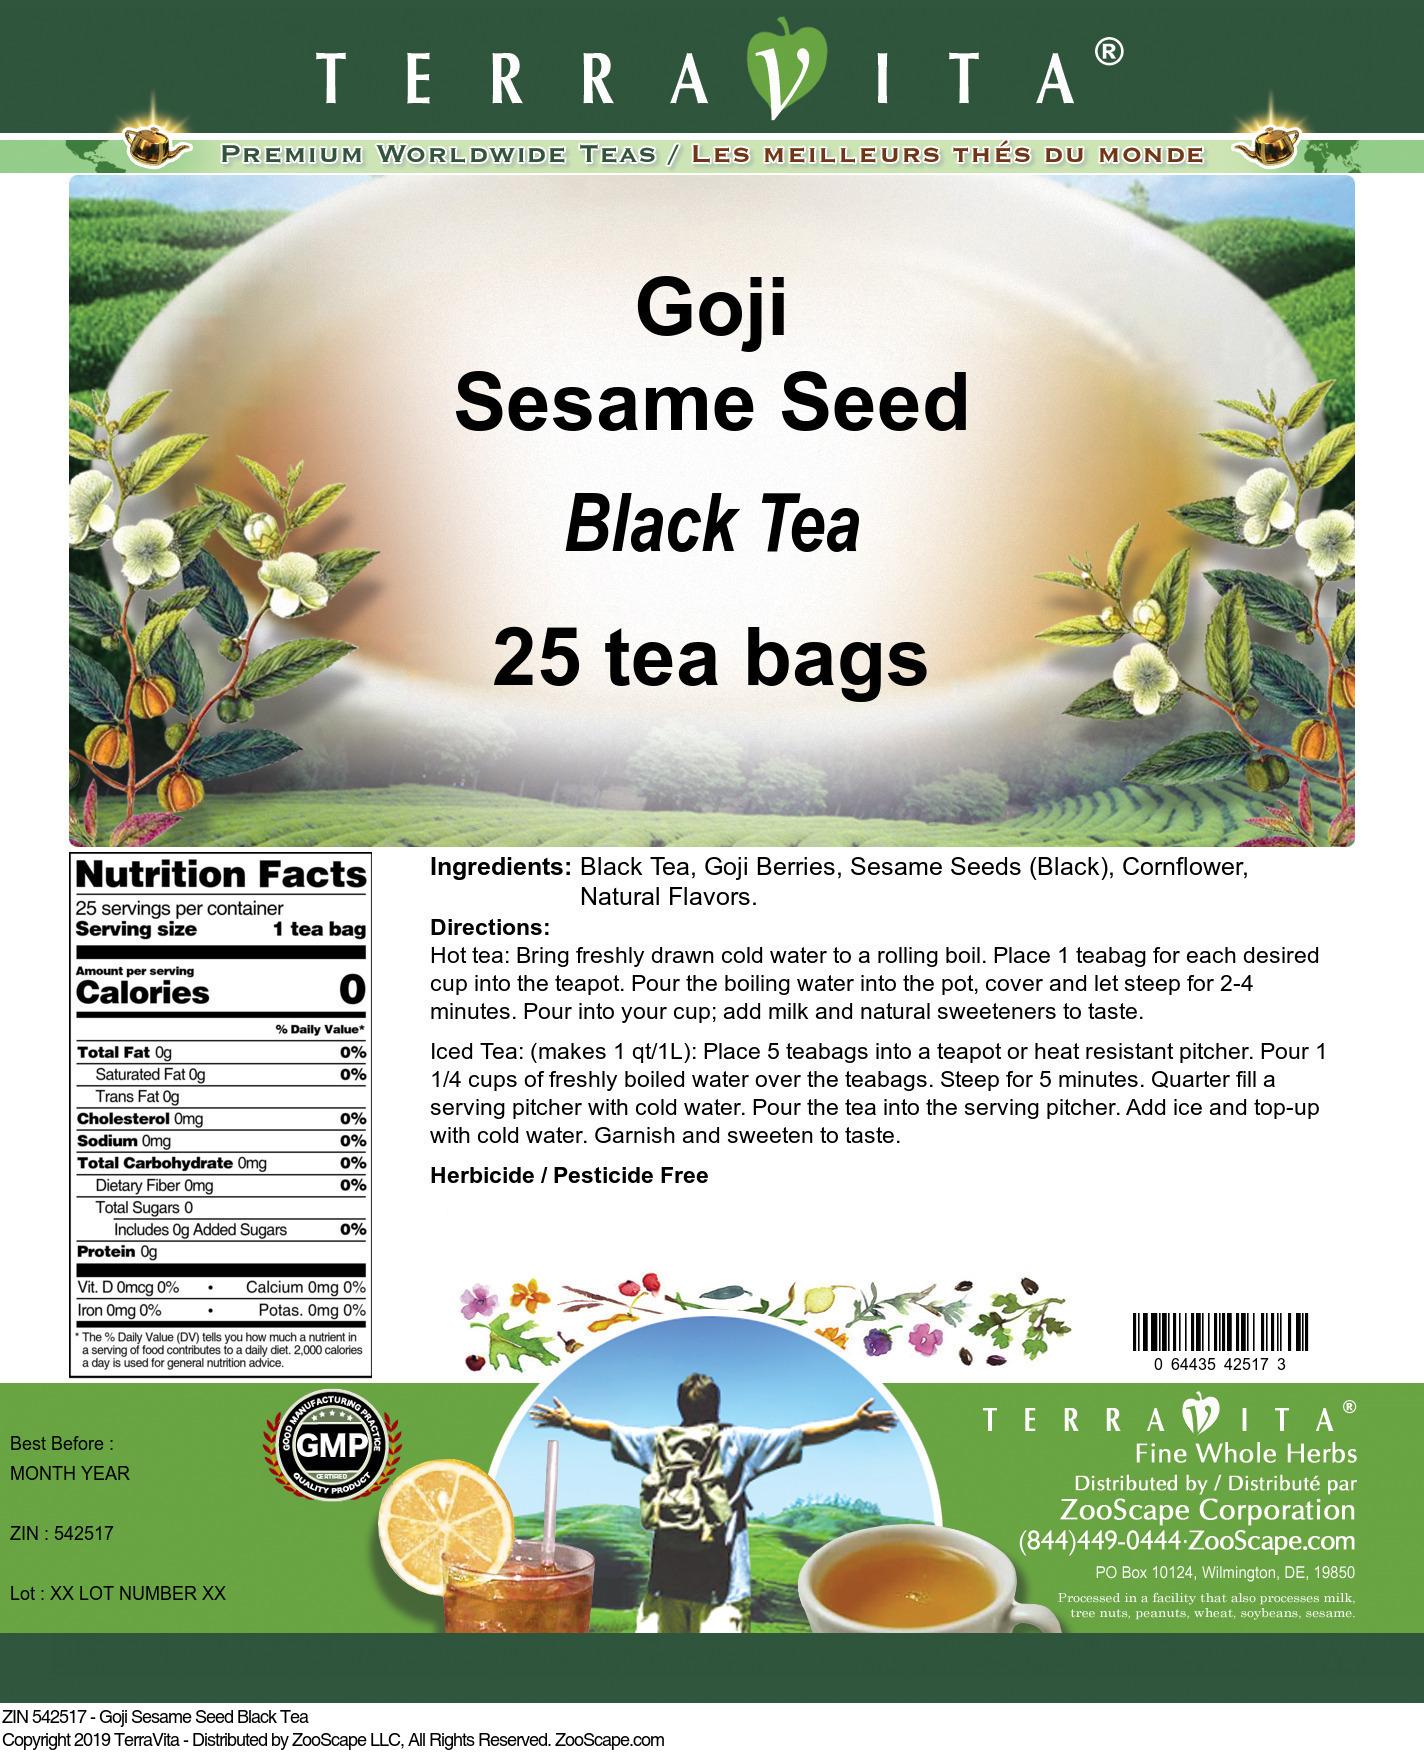 Goji Sesame Seed Black Tea